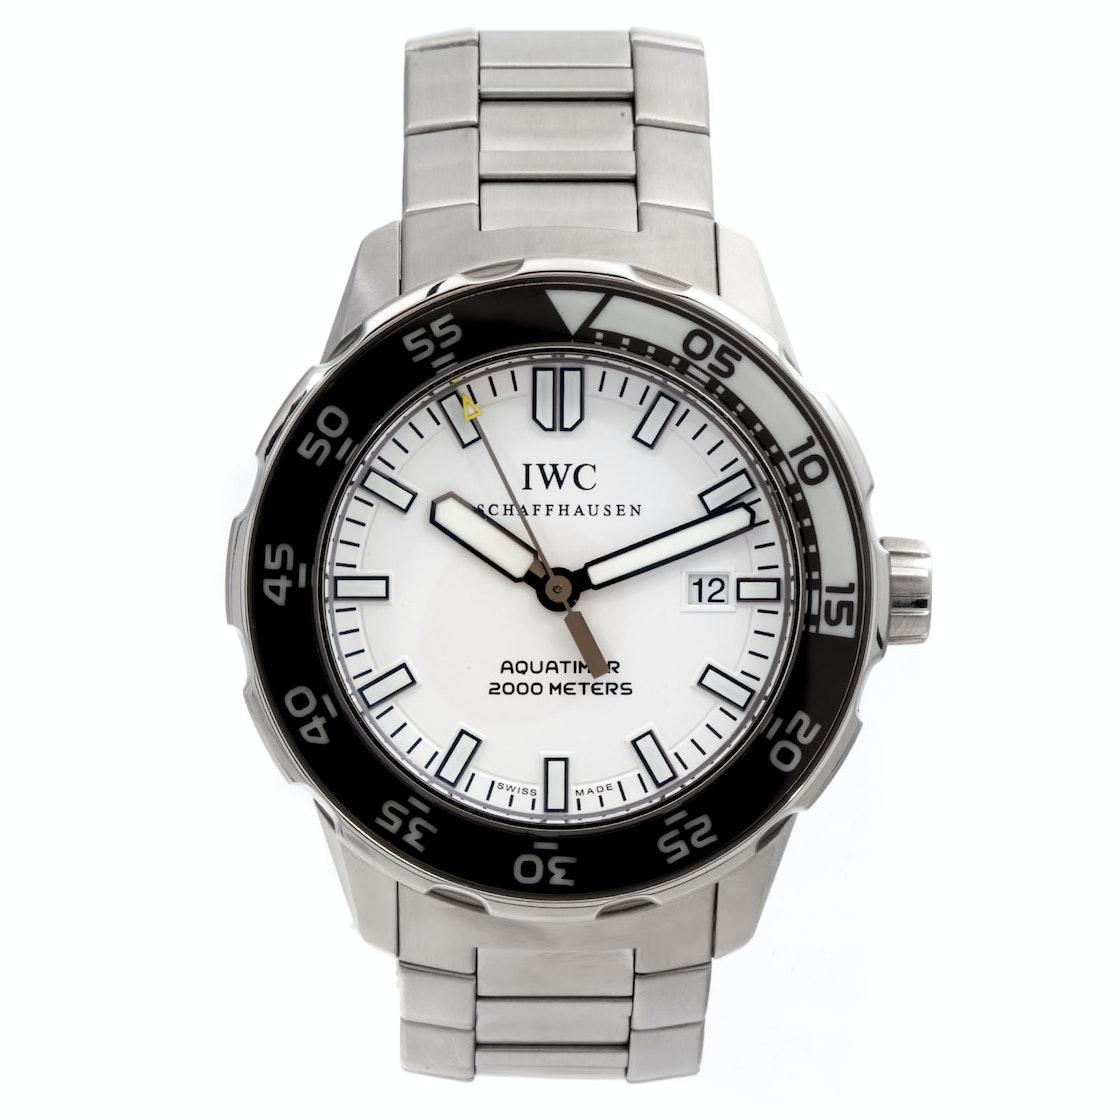 IWC Aquatimer 2000IW3568-05